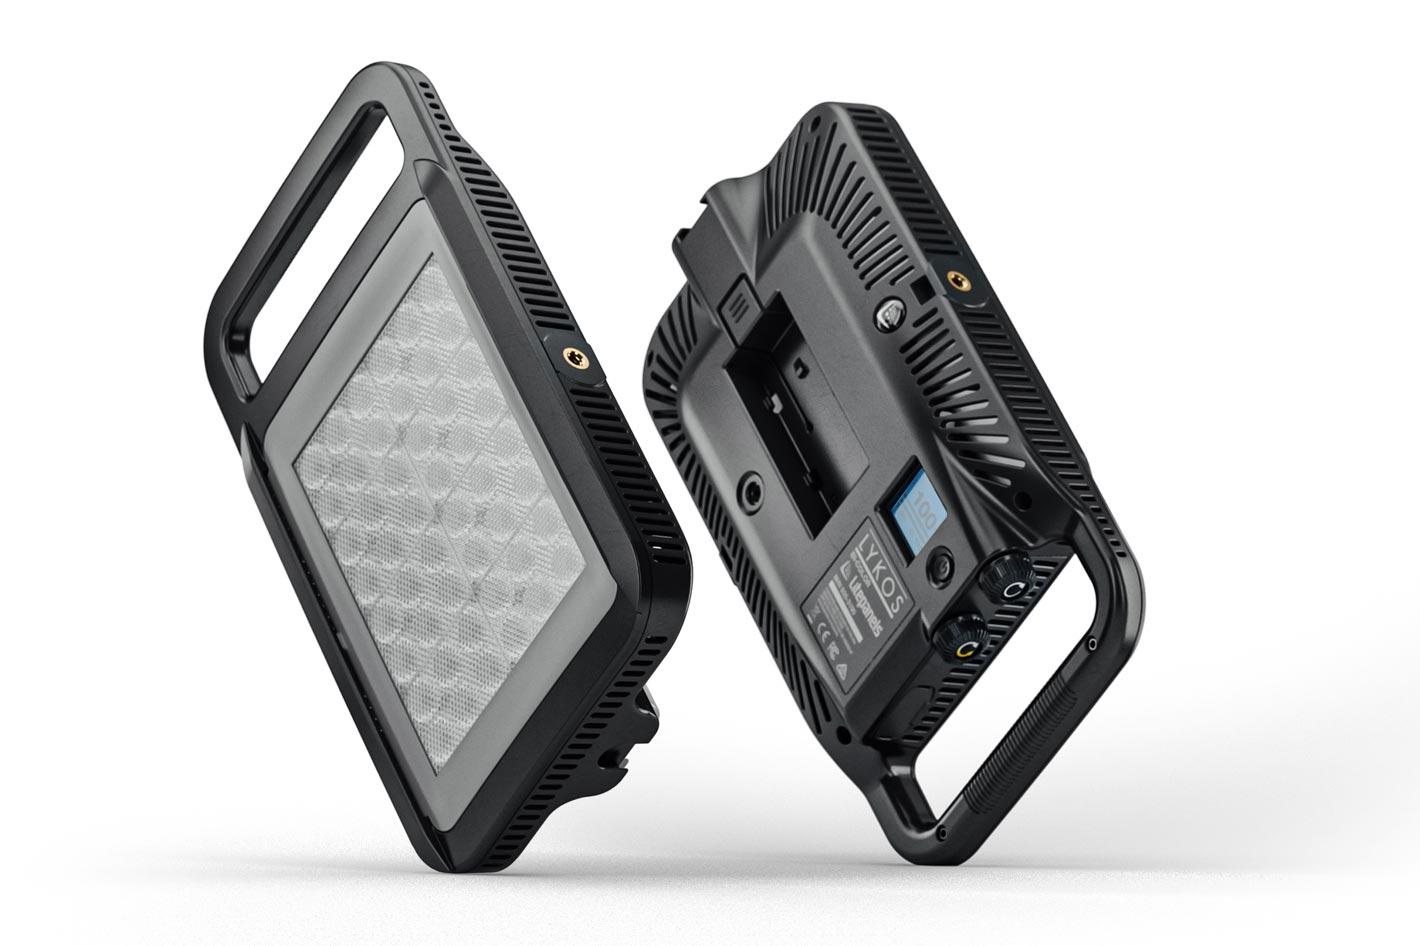 Litepanels launch brighter Lykos+ Mini LED panel